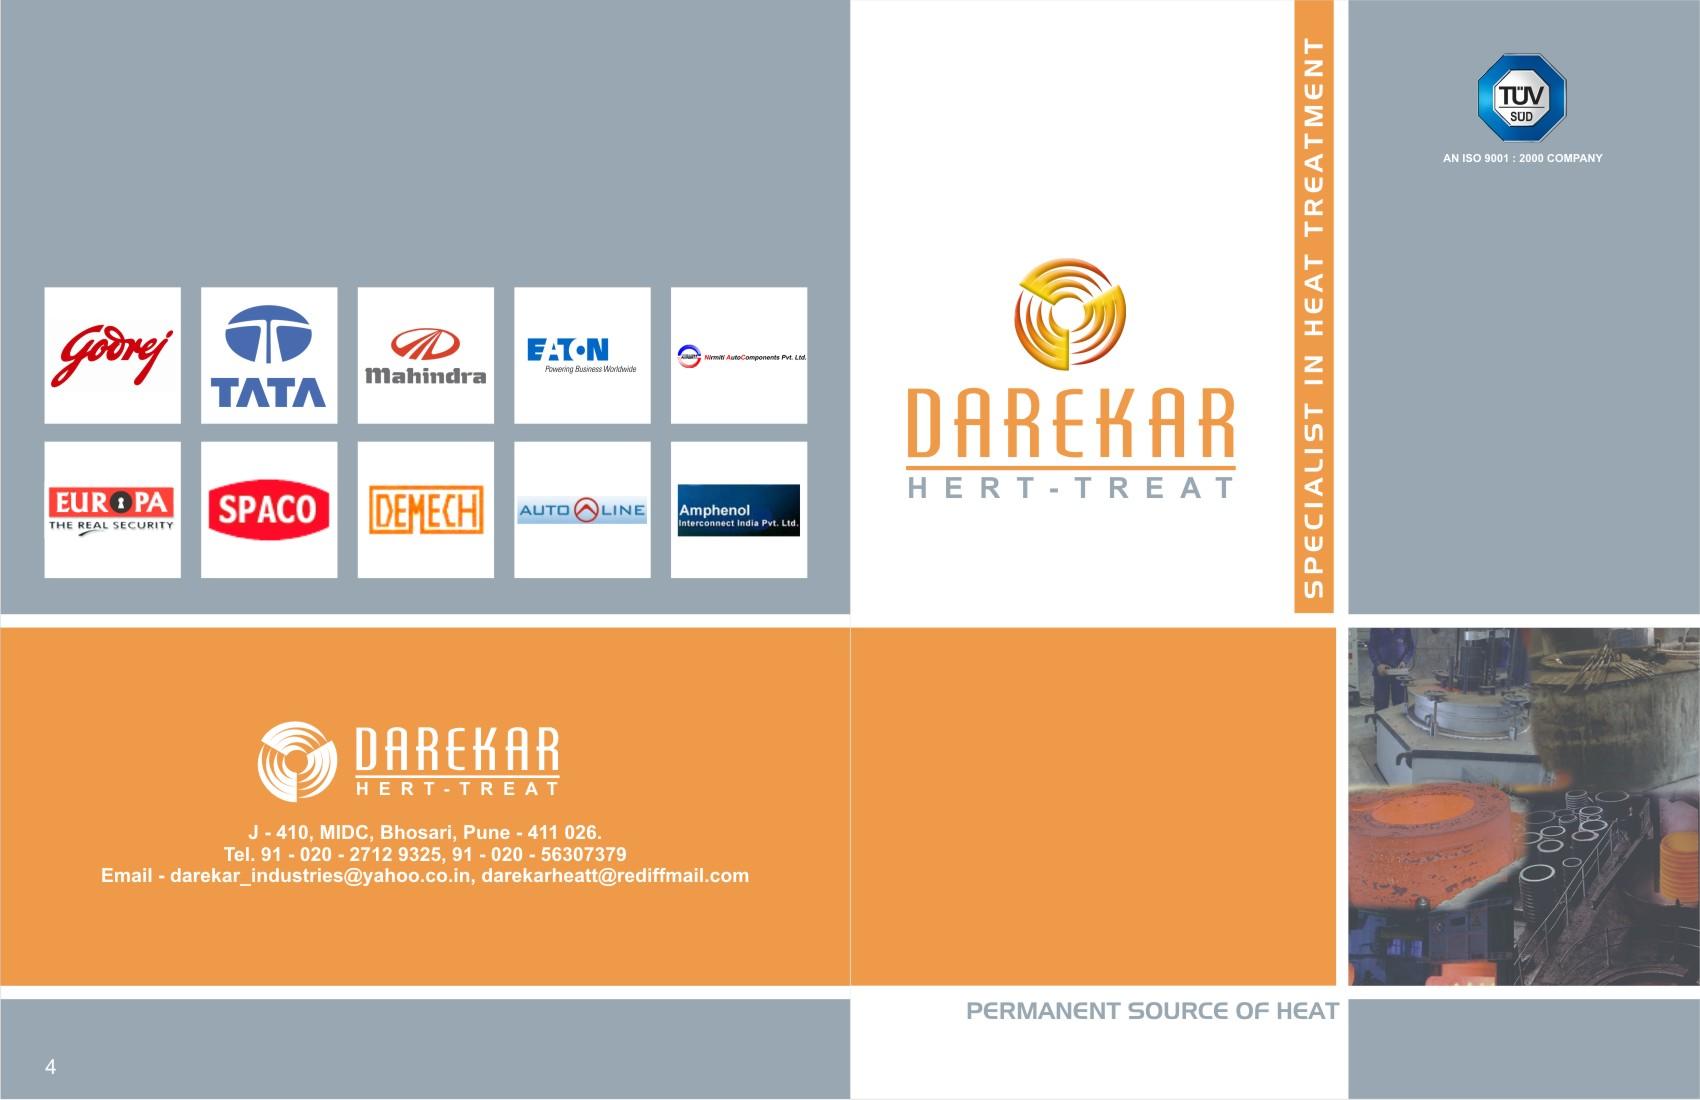 darekar-heat-treatment-catalogue-graphic-design